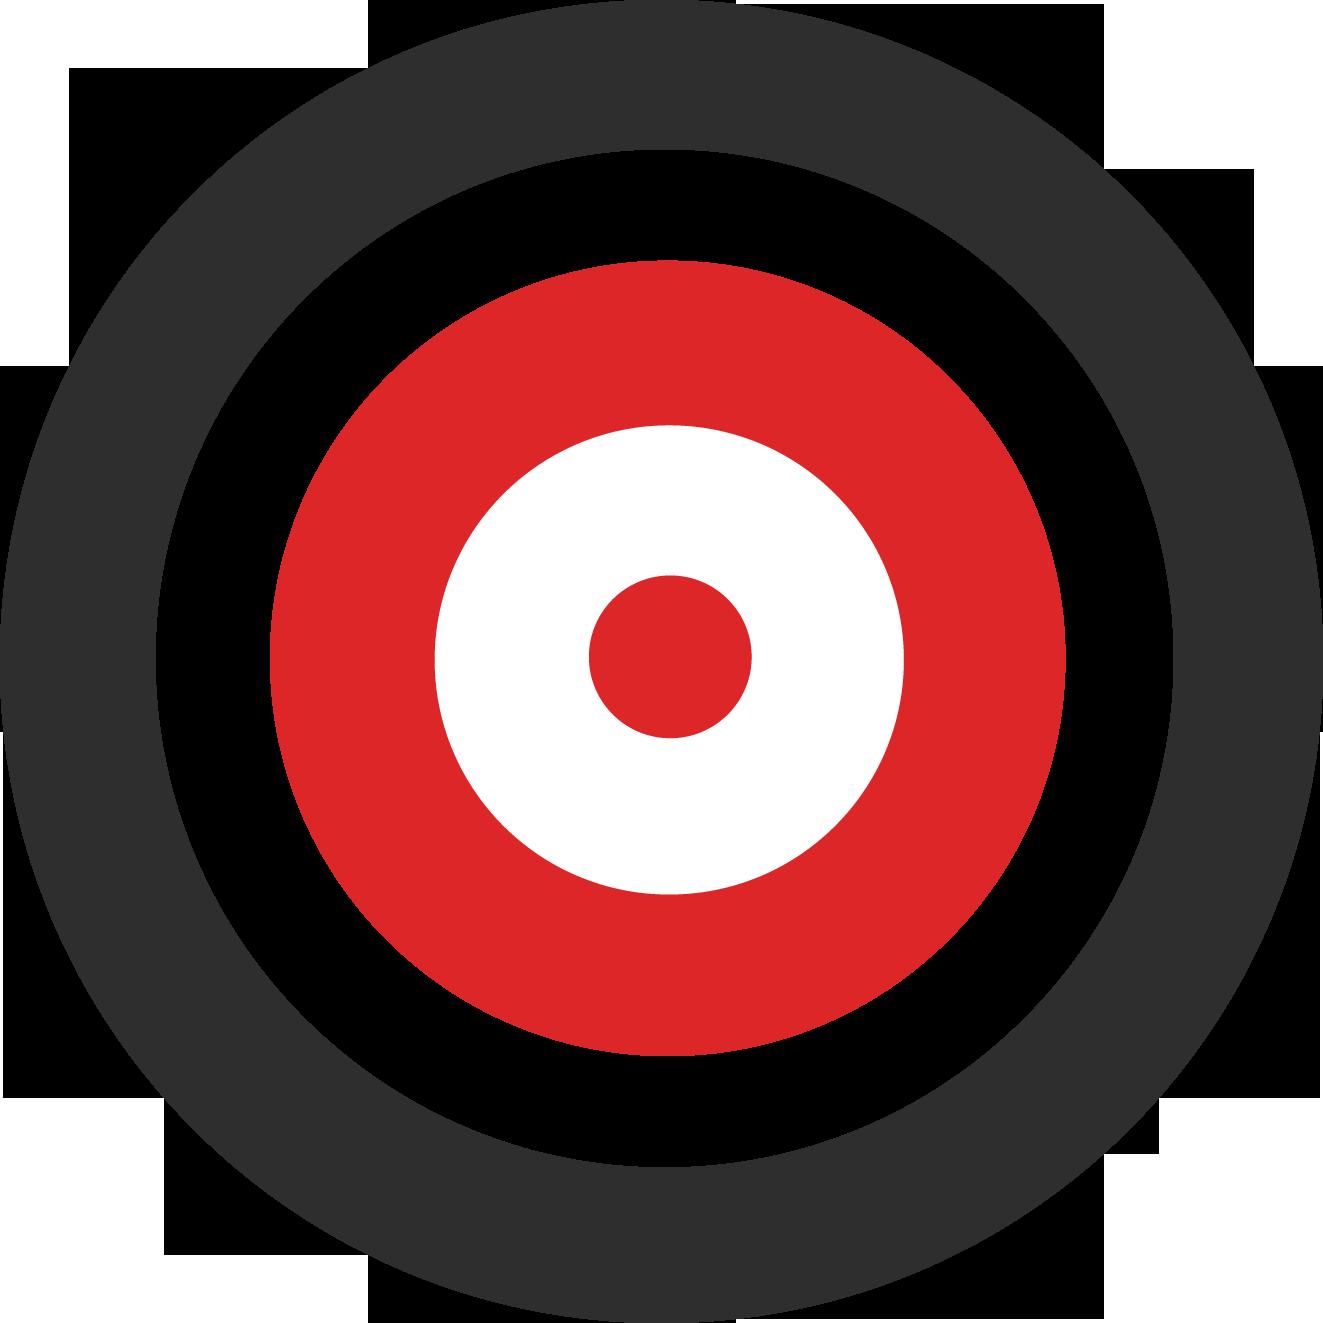 Focus clipart target arrow. Symbol arrows academy zone